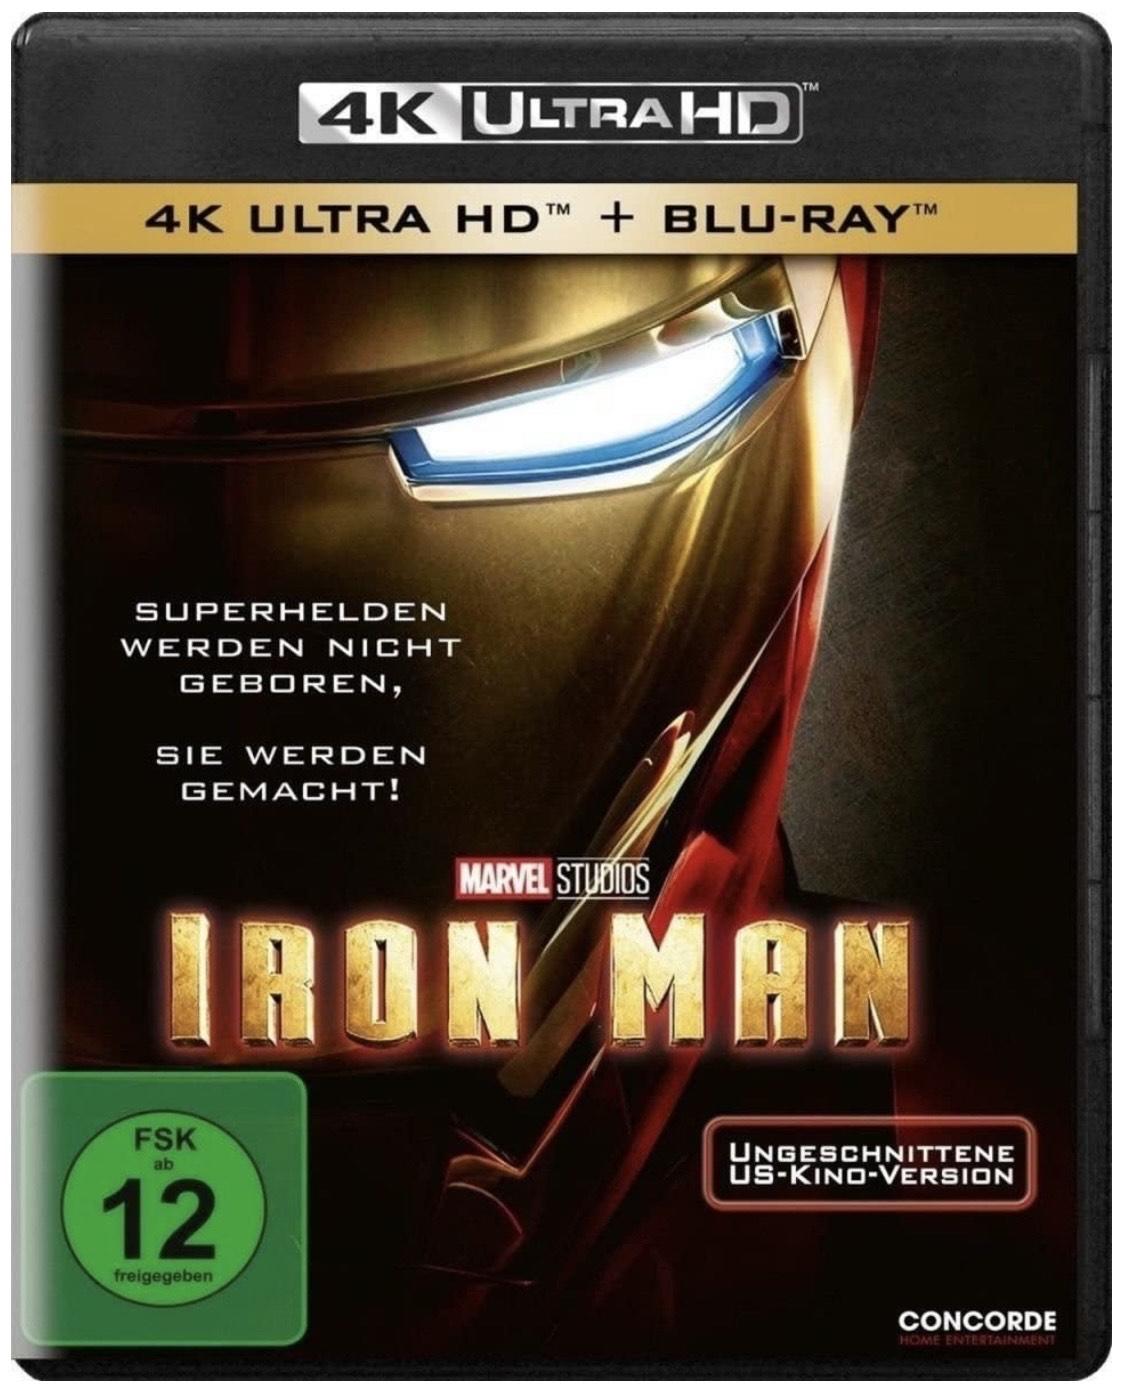 Iron Man [4K Ultra HD] + Blu-ray